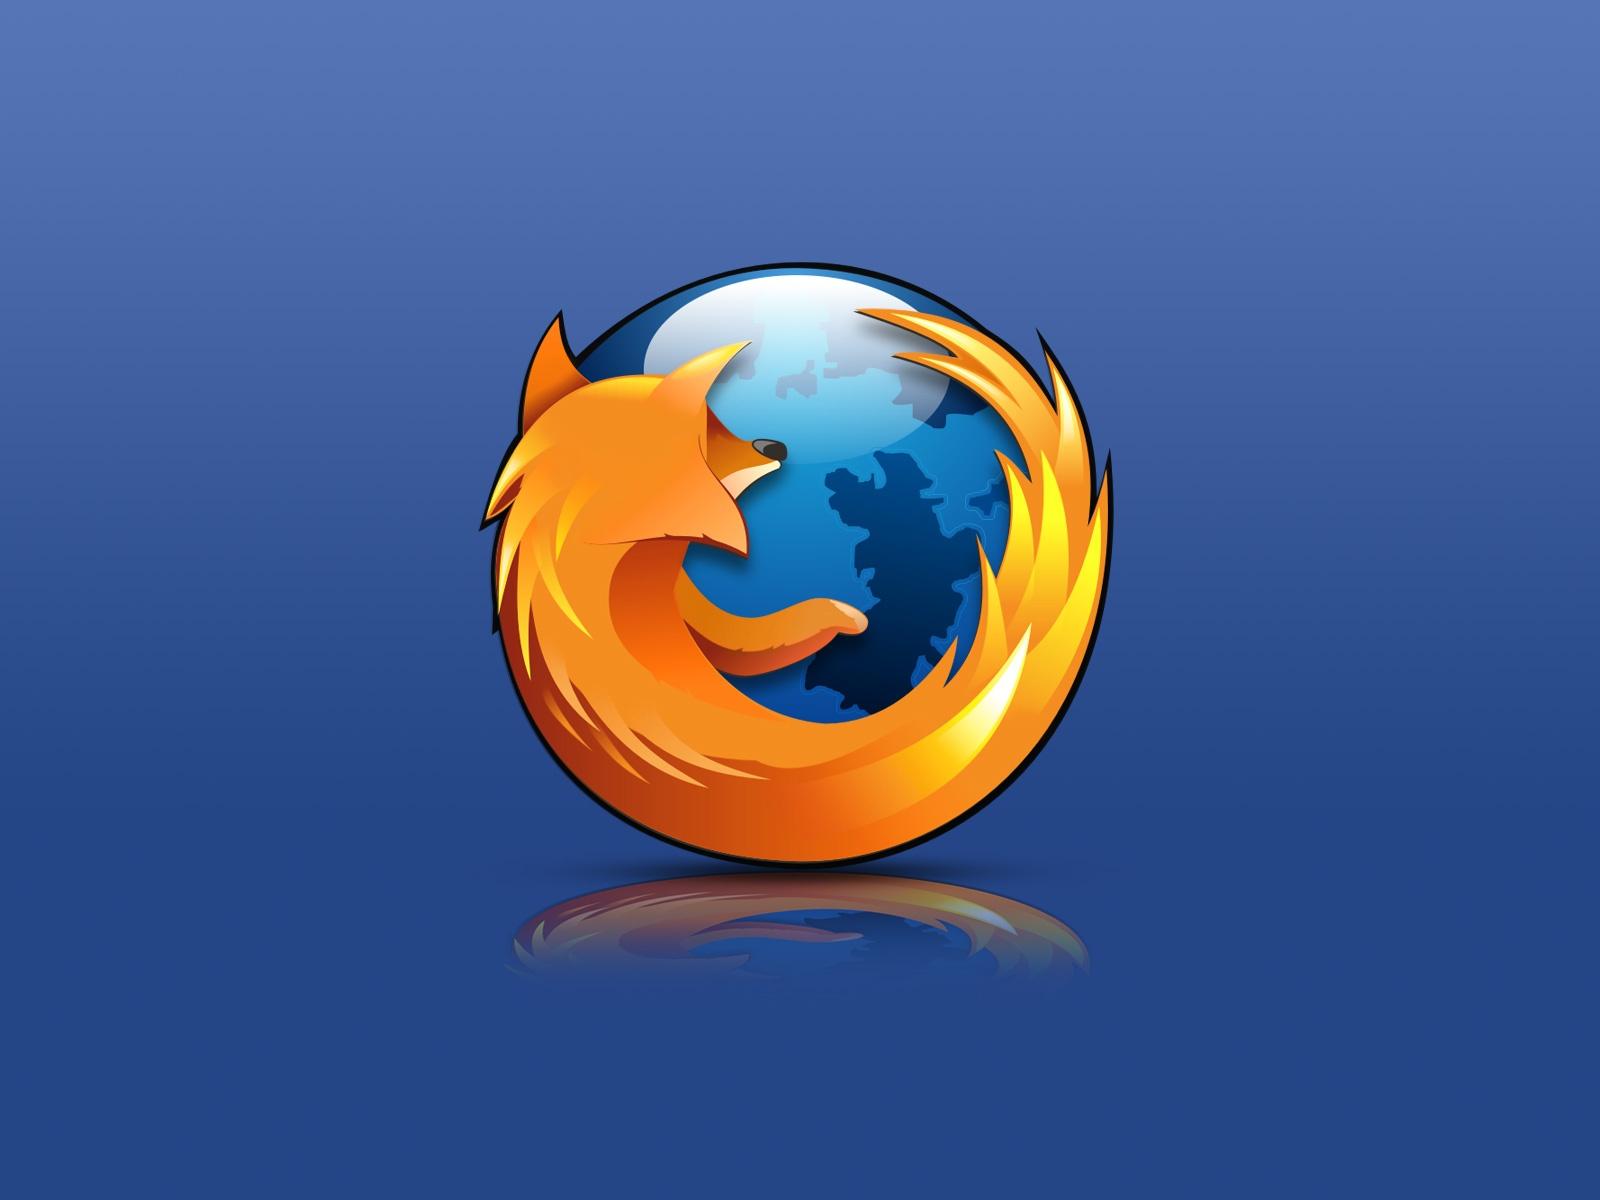 Mozilla Firefox Art Wallpapers | HD Wallpapers